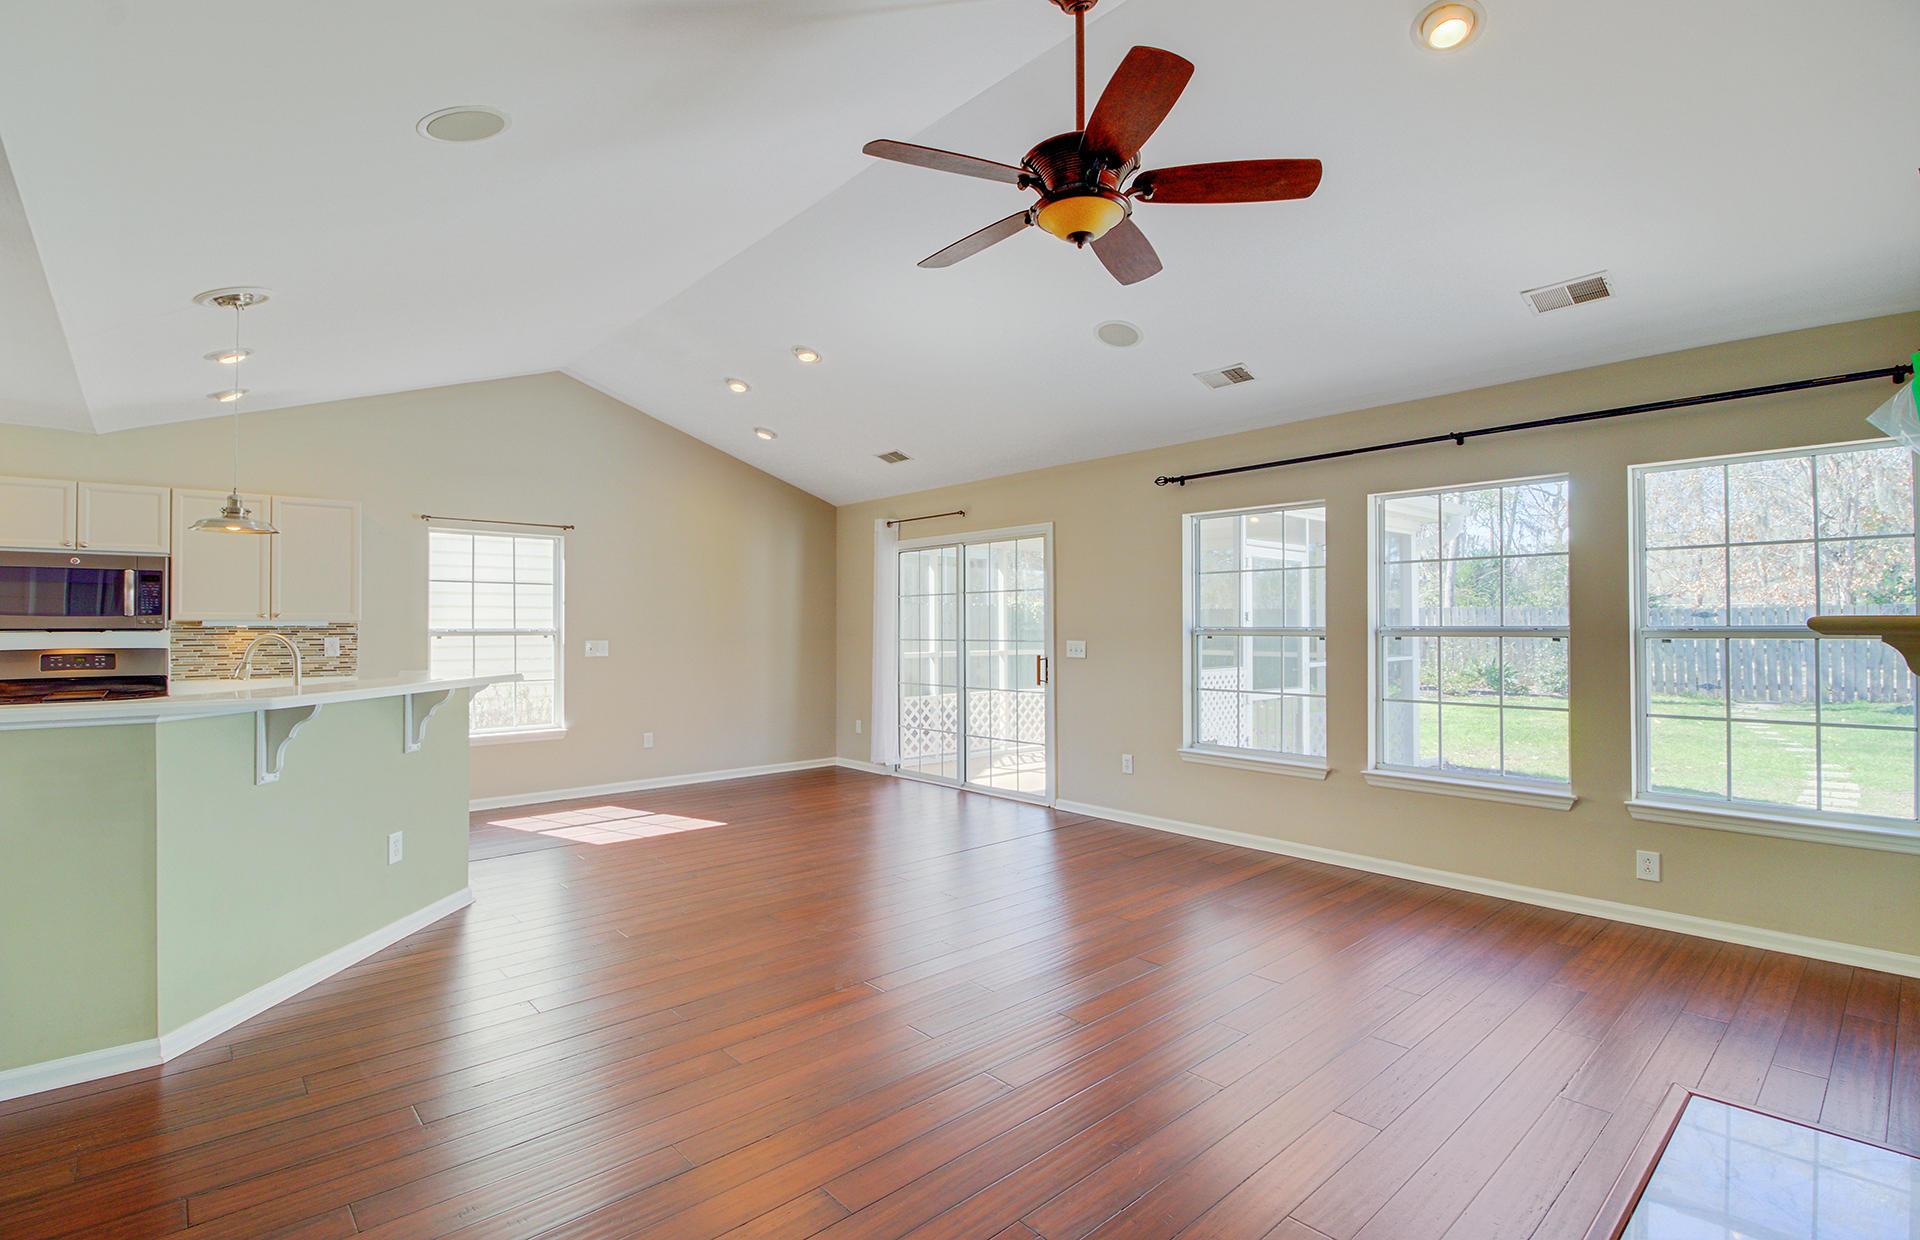 Grand Oaks Plantation Homes For Sale - 789 Bent Hickory, Charleston, SC - 6